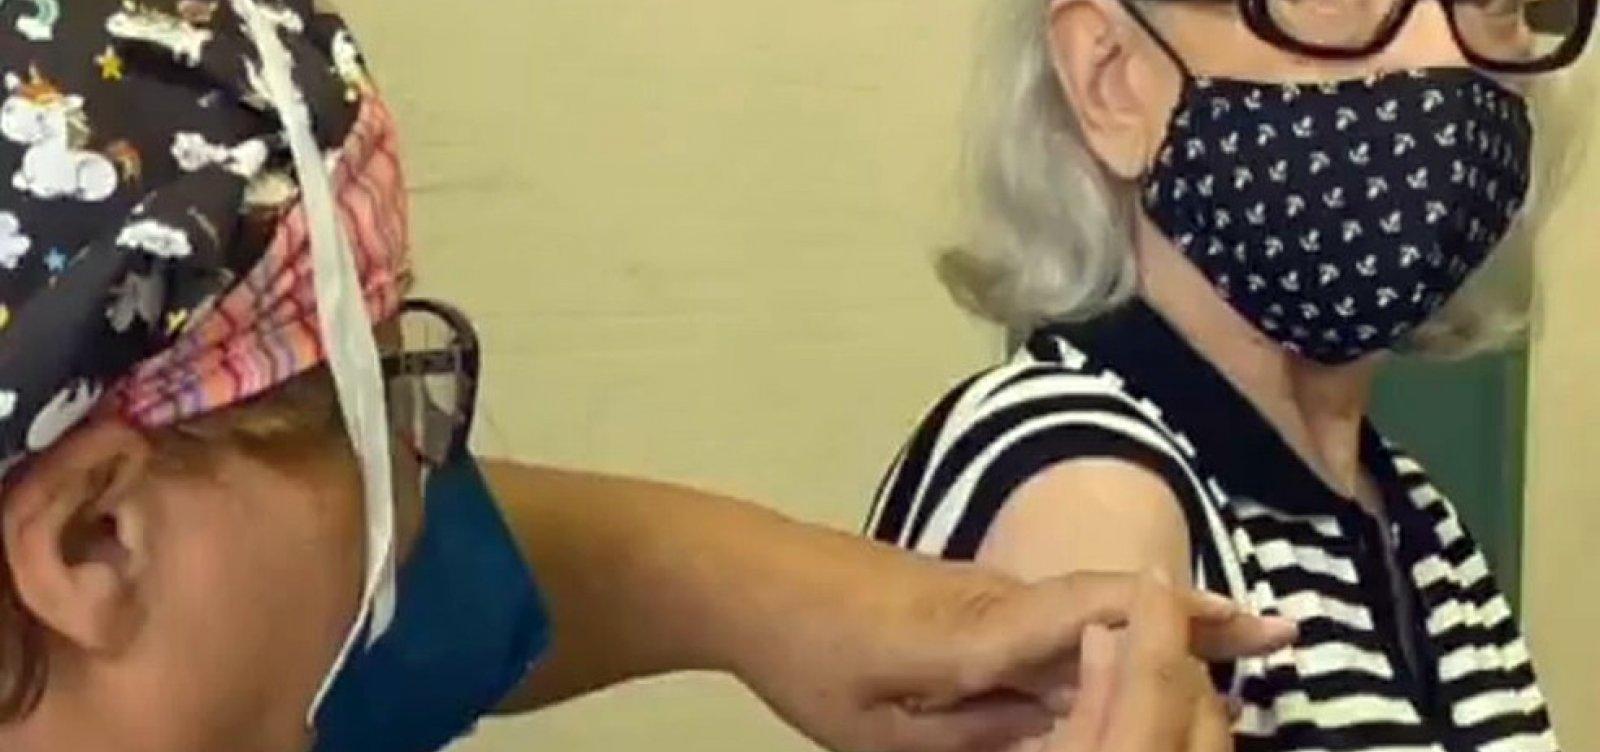 [Fernanda Montenegro é vacinada contra a Covid-19 no Rio de Janeiro]